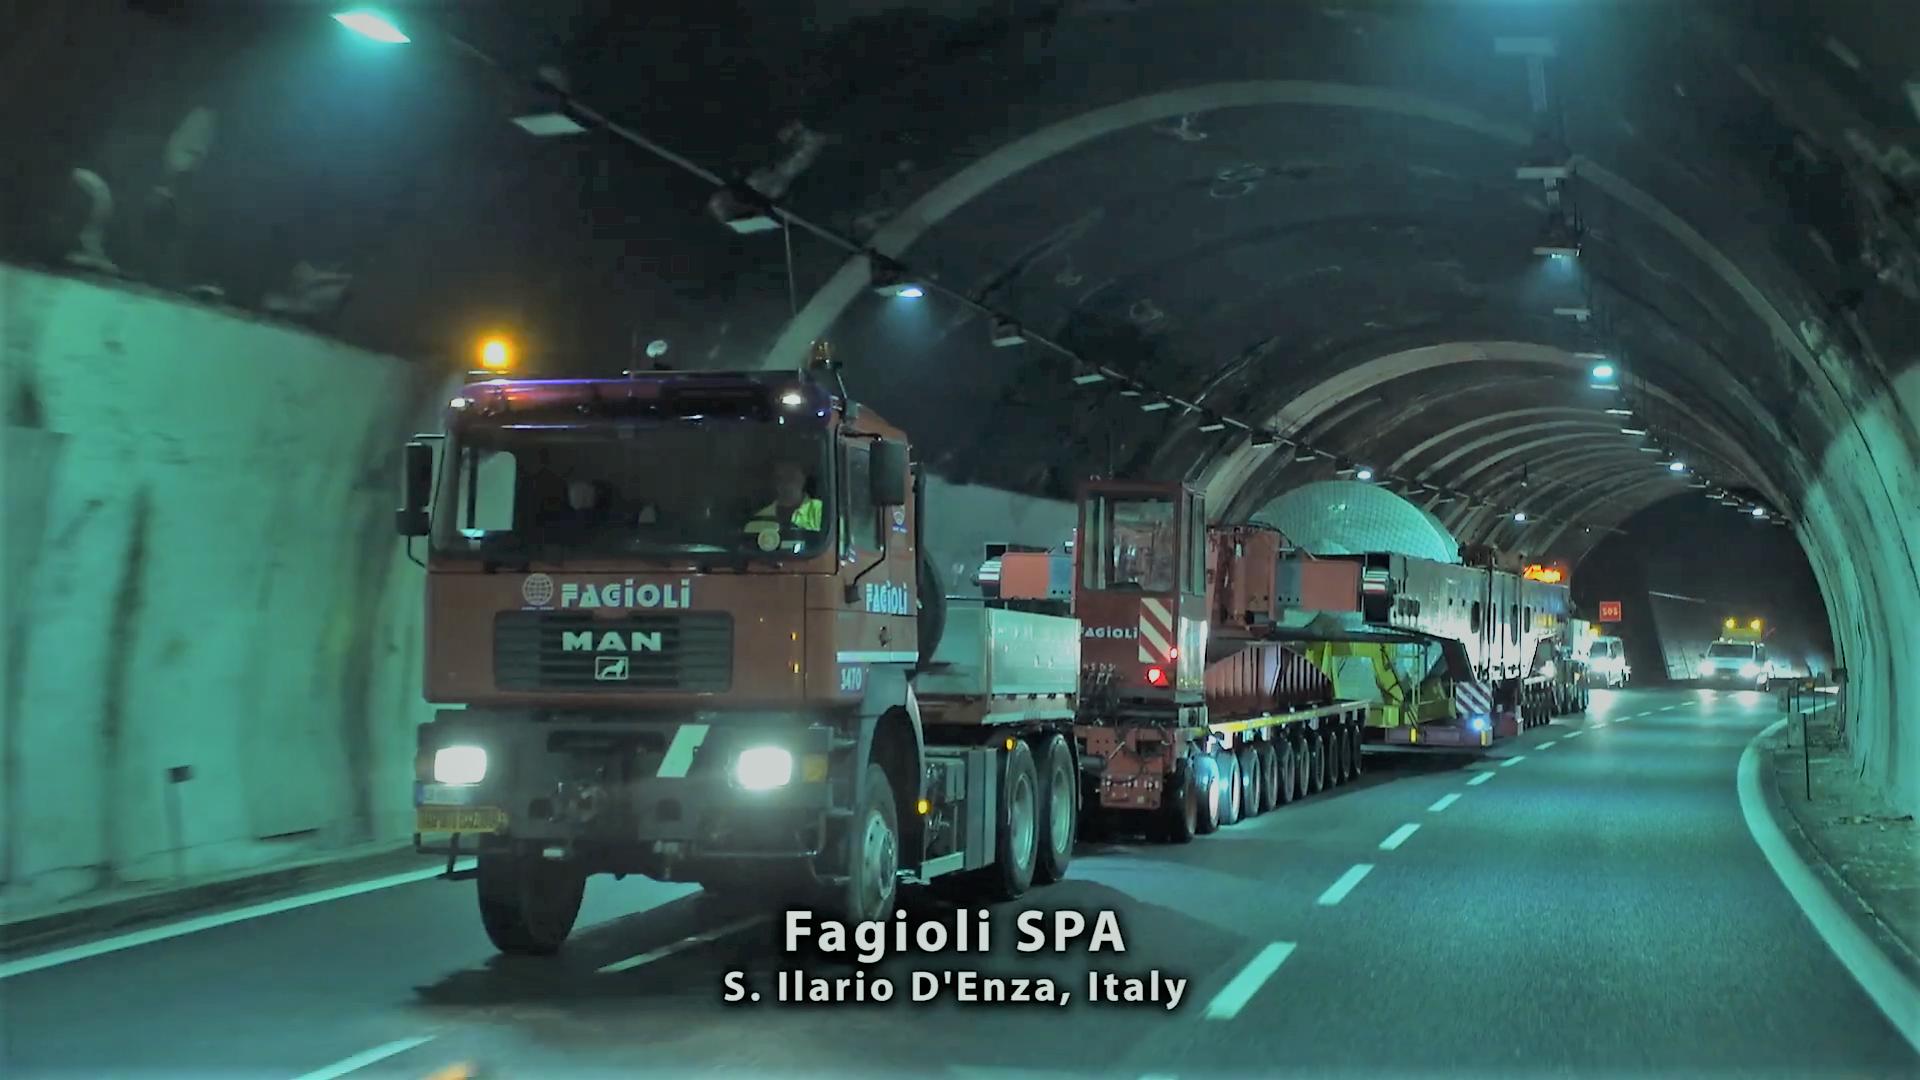 Fagioli SPA transporting rotors in tunnel